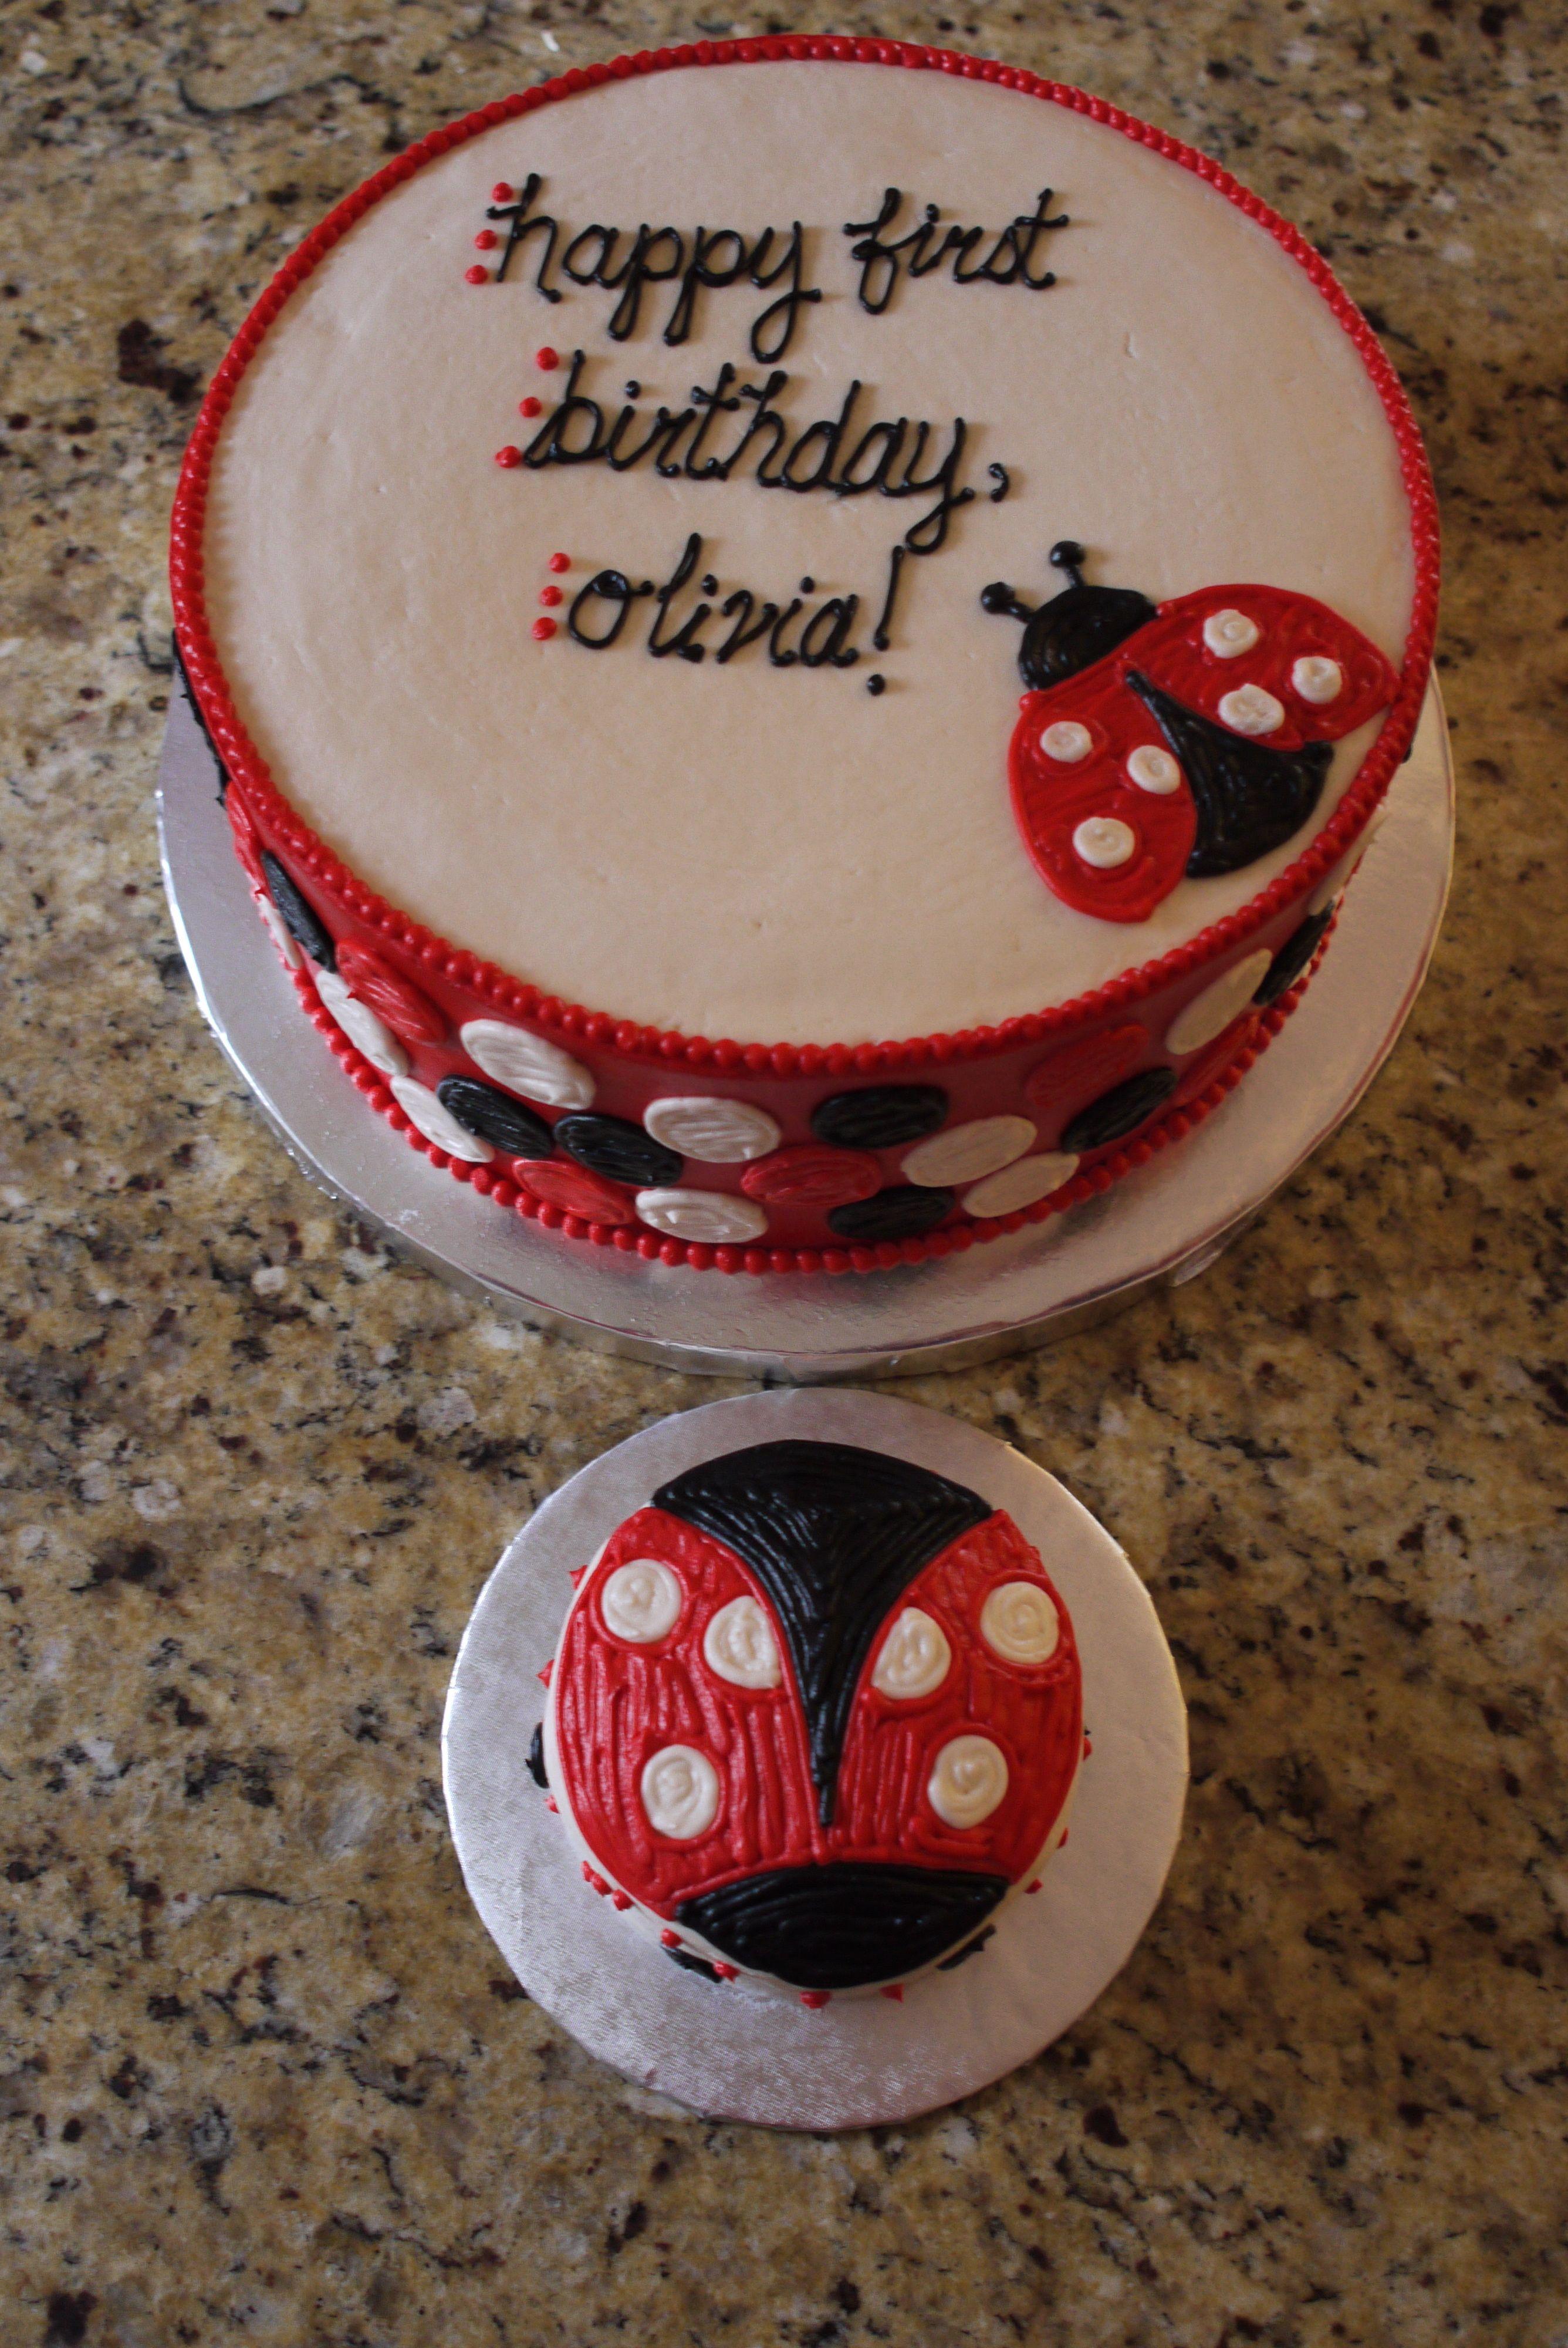 Stupendous Ladybug Cake And Ladybug Smash Cake For A First Birthday Personalised Birthday Cards Cominlily Jamesorg